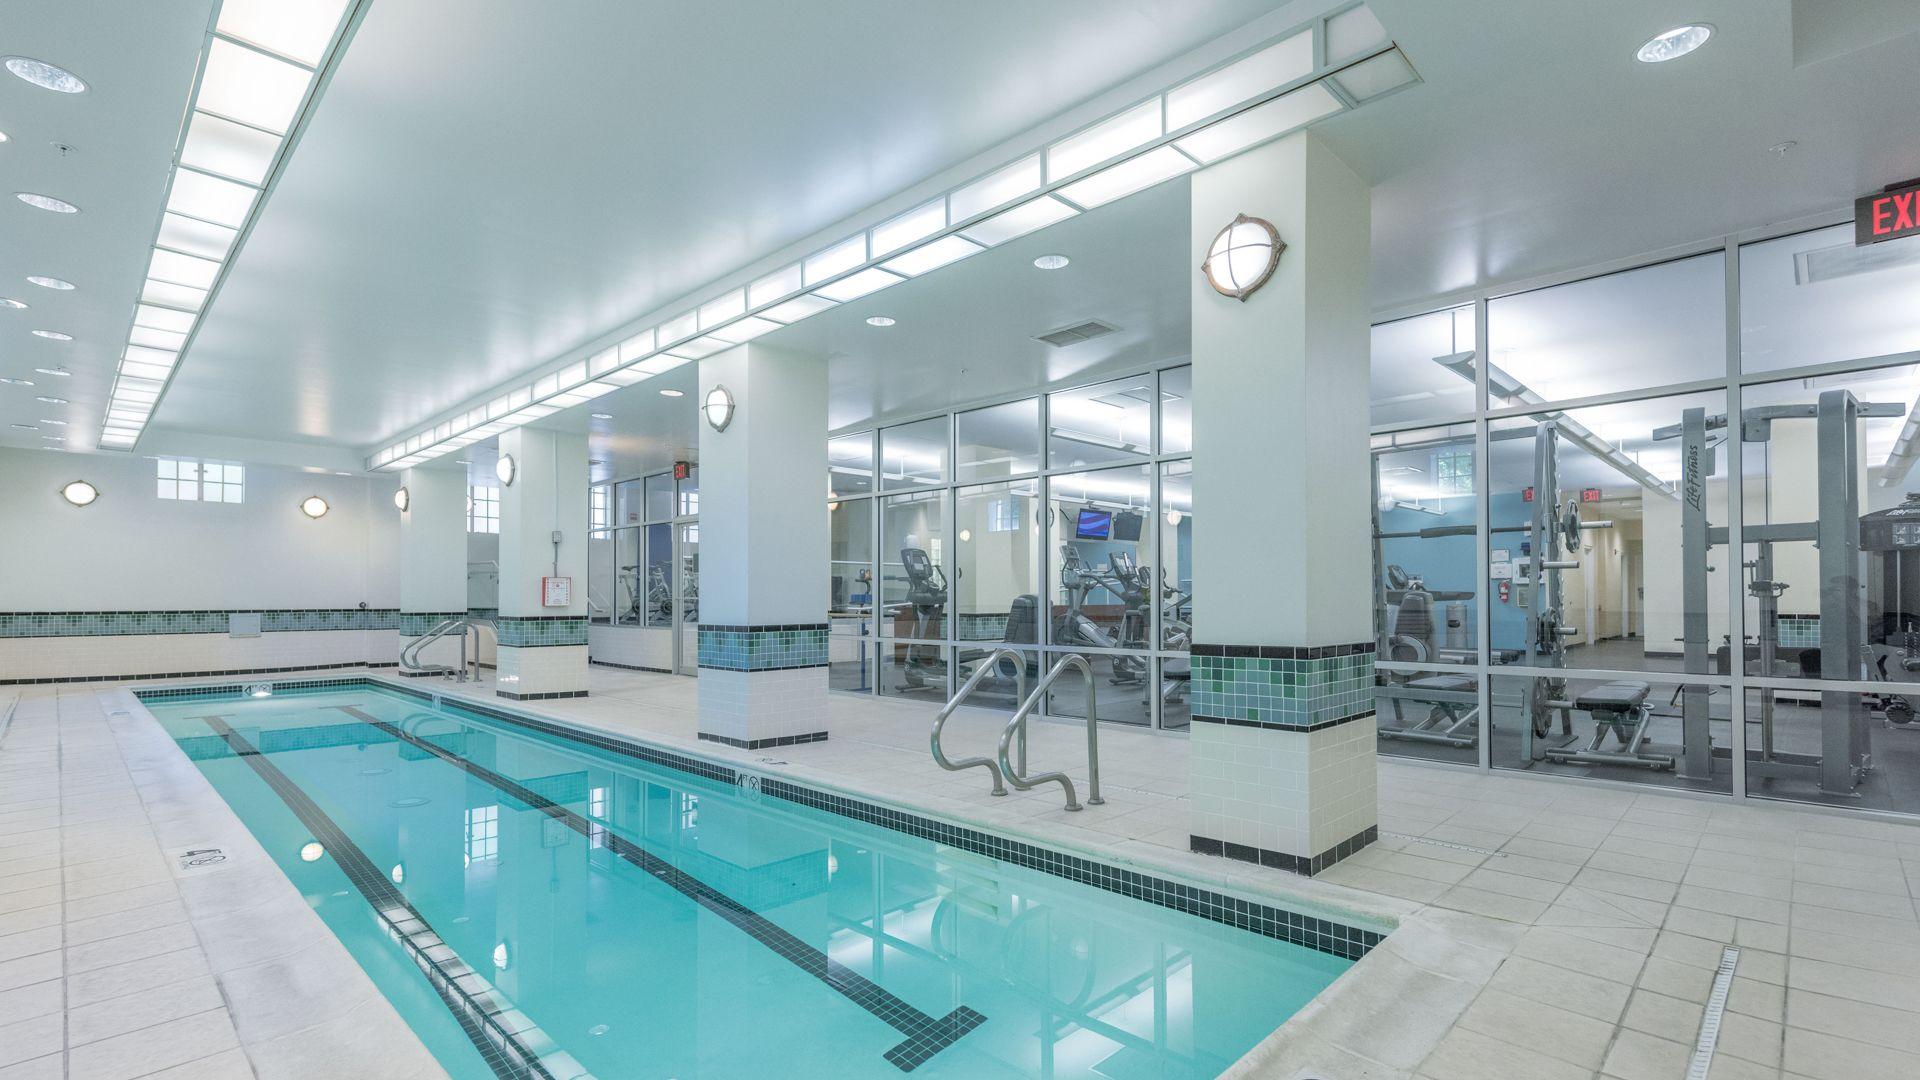 alban-towers-apartments-swimming-pool.jpg